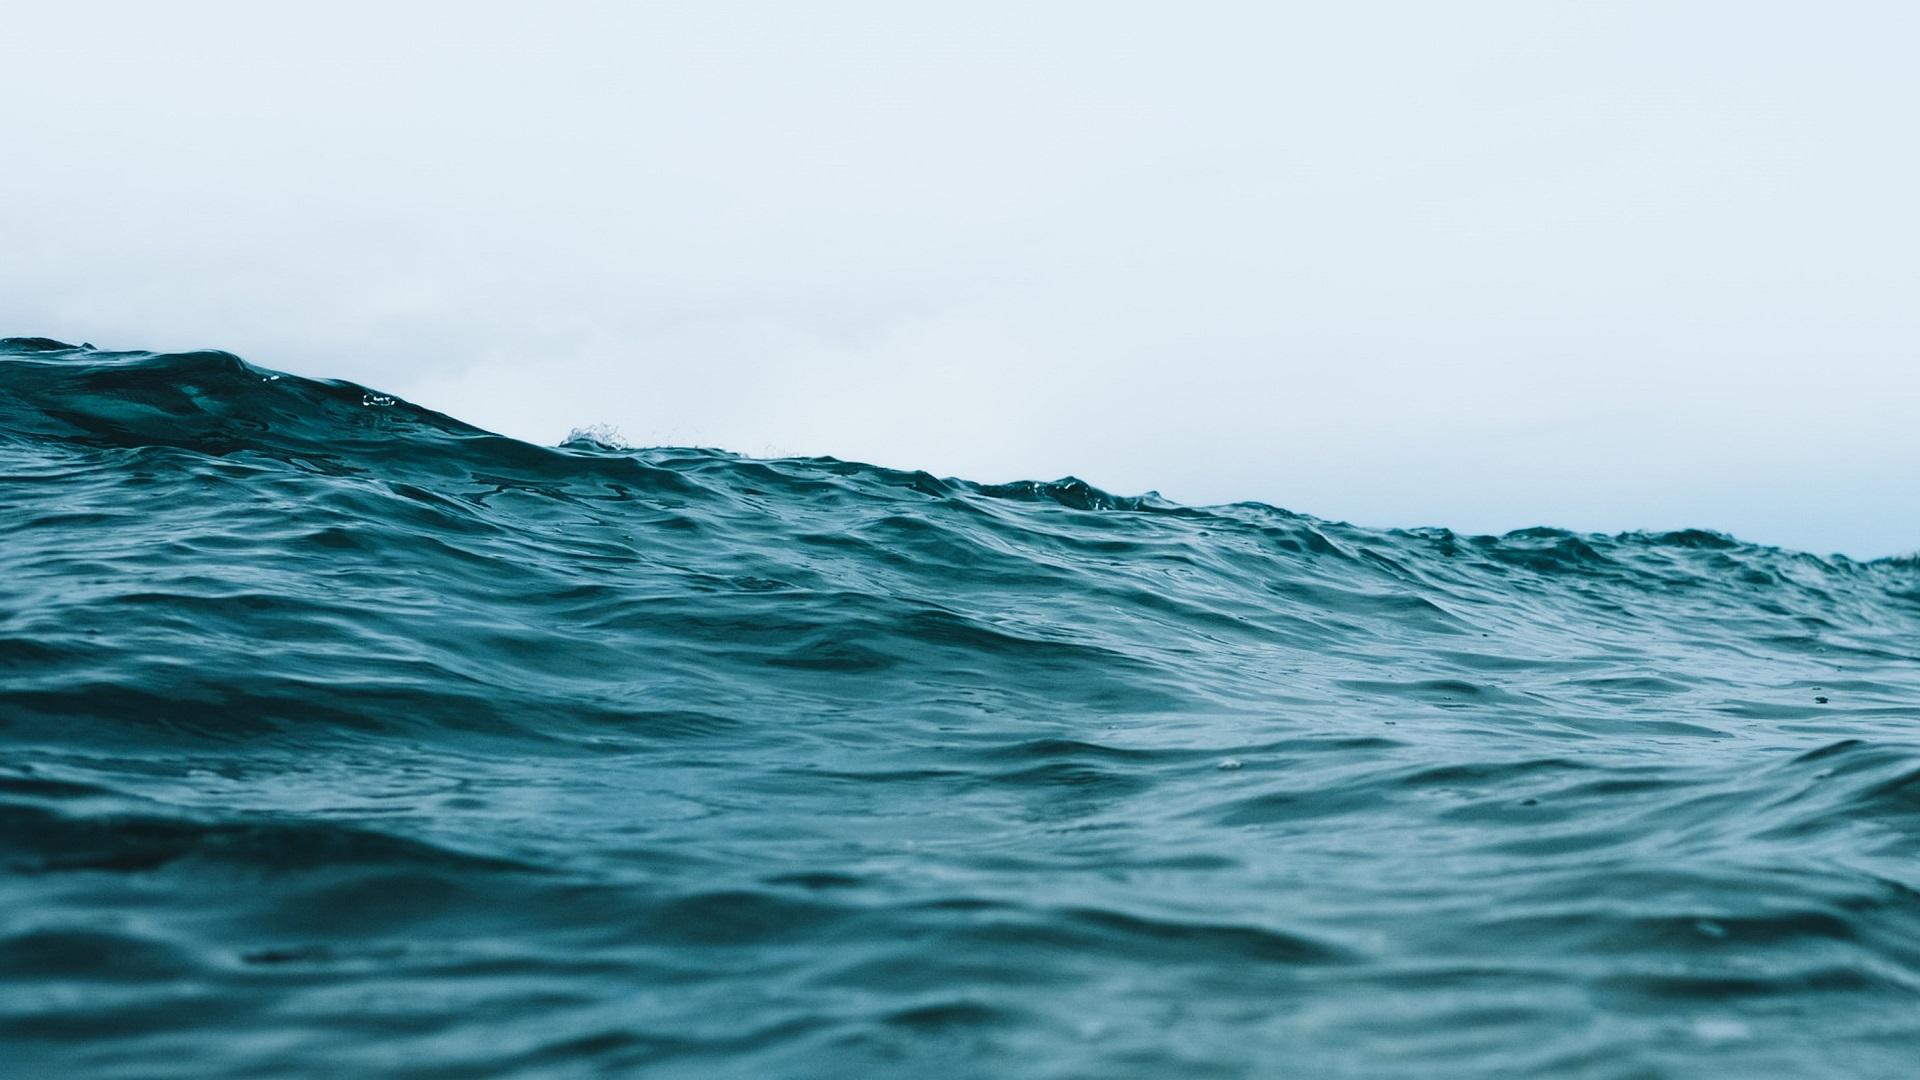 Océano. Foto de Thierry Meier / Unsplash